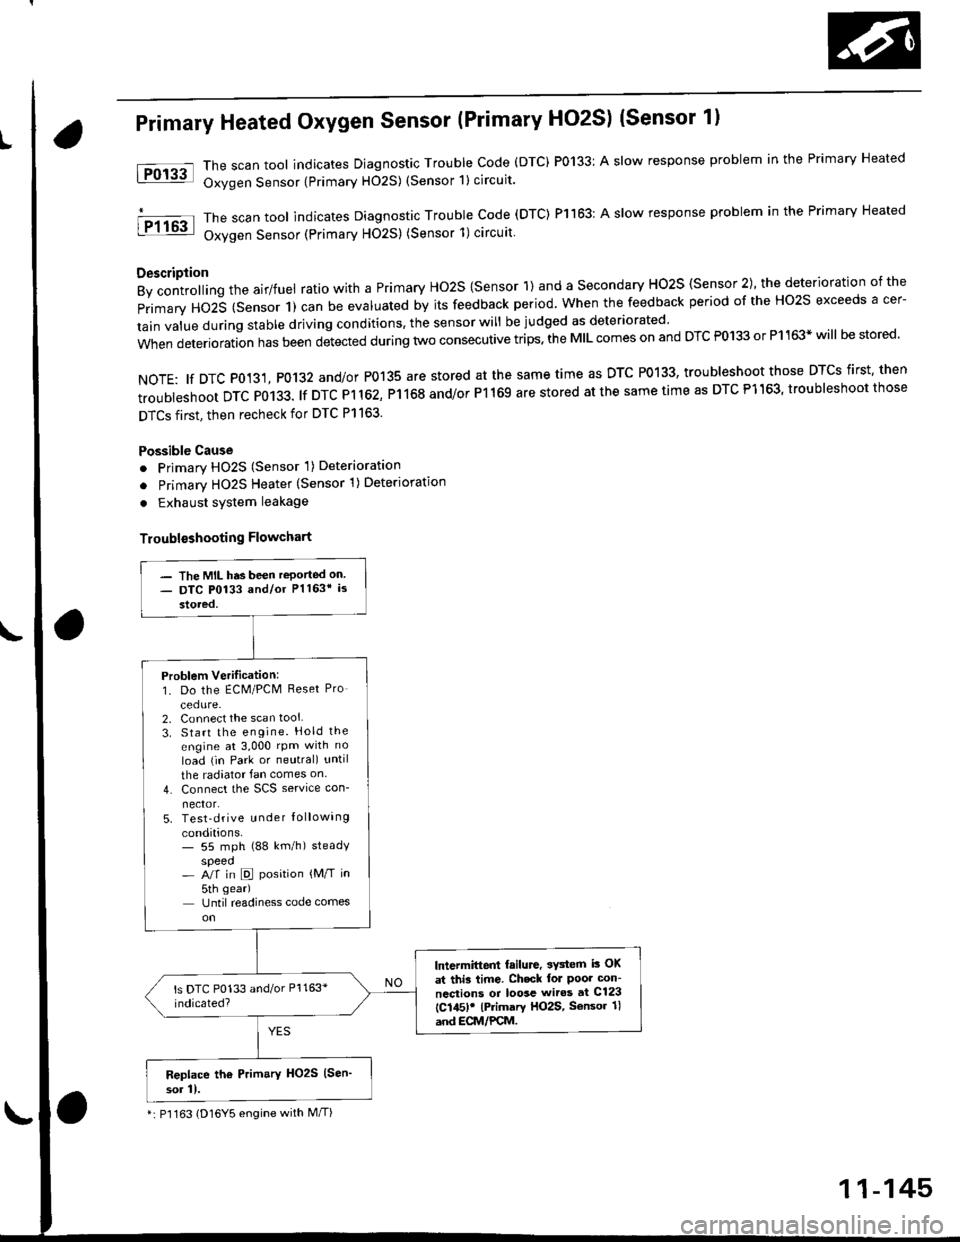 Esp Honda Civic 2000 6g Workshop Manual 19962000 Electrical Troubleshooting Original Page 414